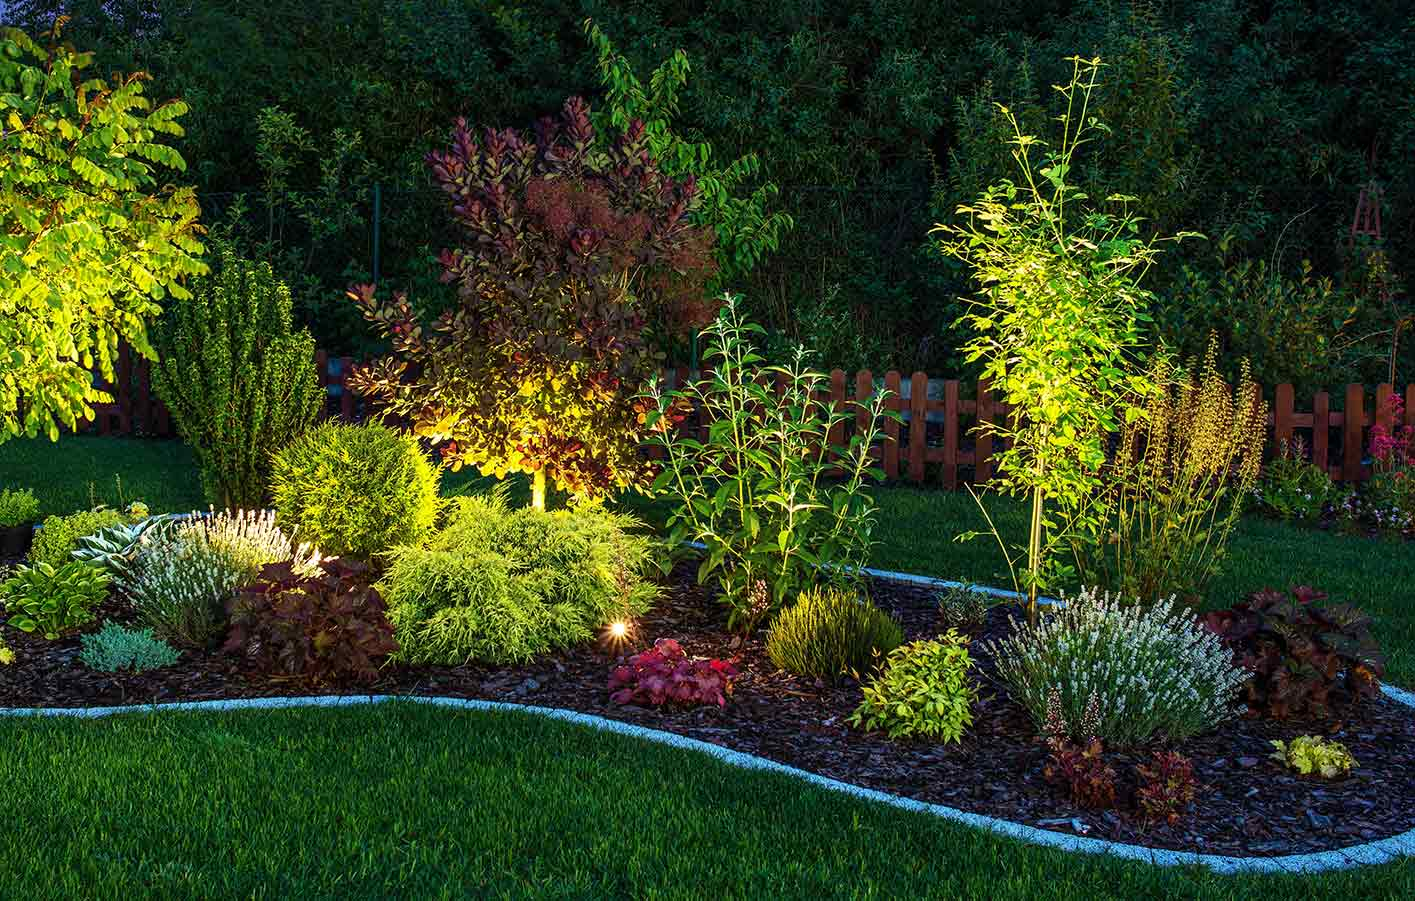 Garten wande gestalten for Kleingartengestaltung ideen